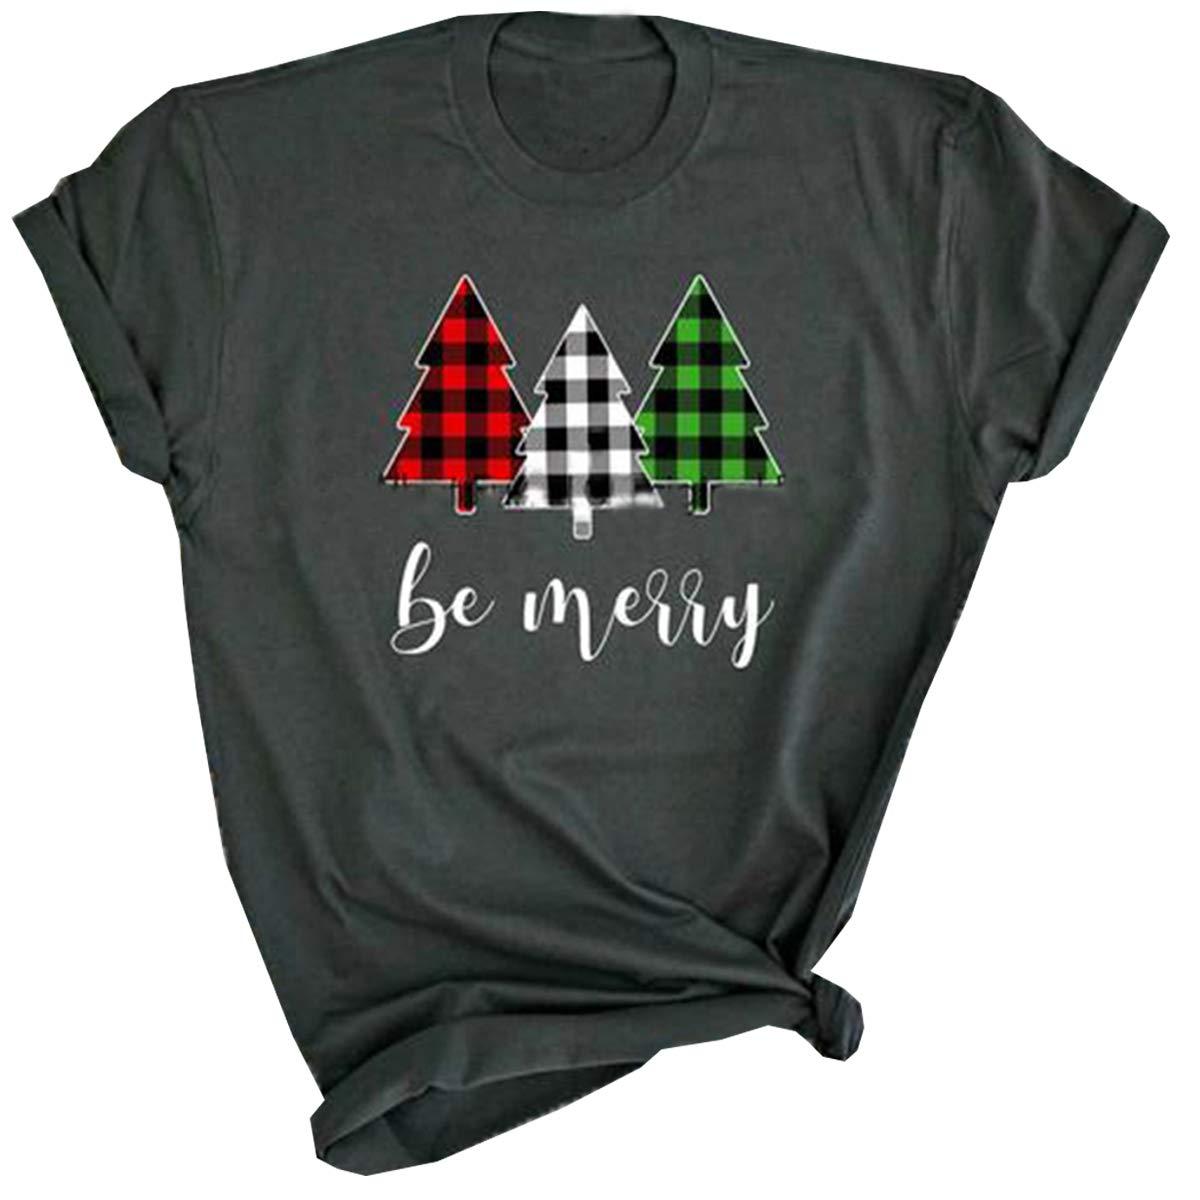 UNIQUEONE be Merry Shirt Women Leopard Plaid Christmas Tree Tshirt Letters Print Casual Holiday Tee Shirts